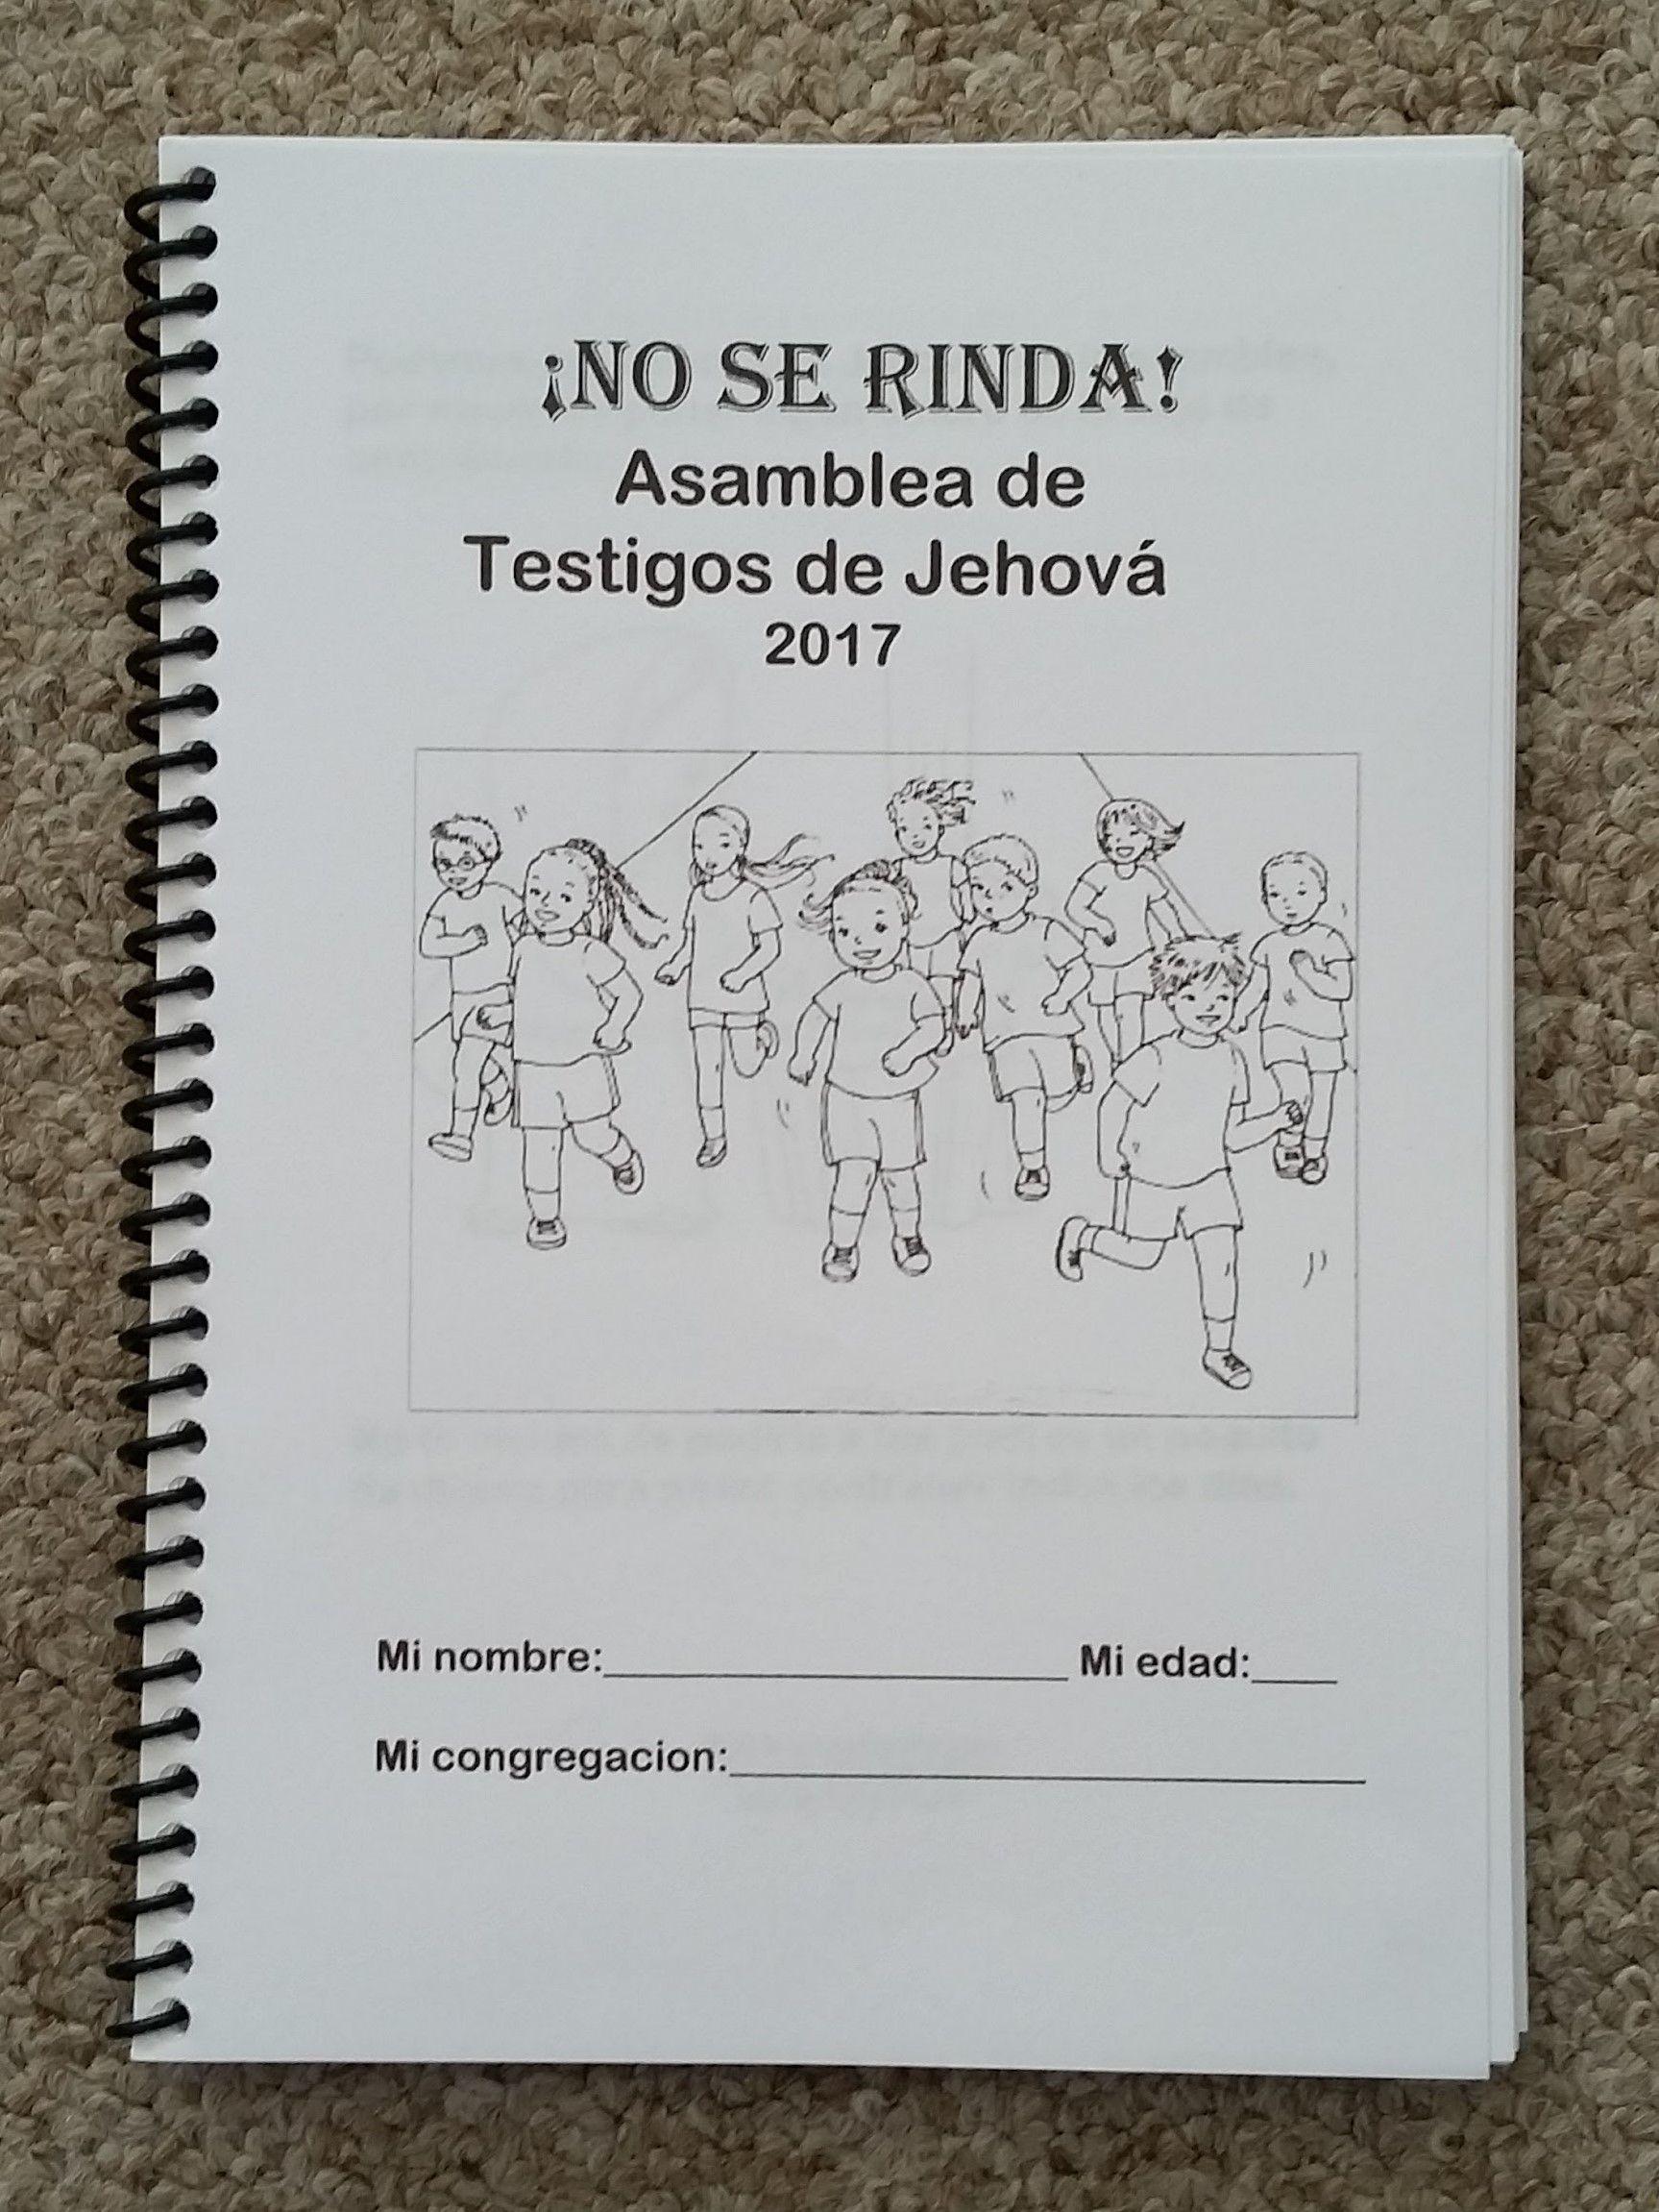 SPANISH 6-12yo Notebook No Se Rinda Espanol Asamblea Activity Sheets, My  Children,